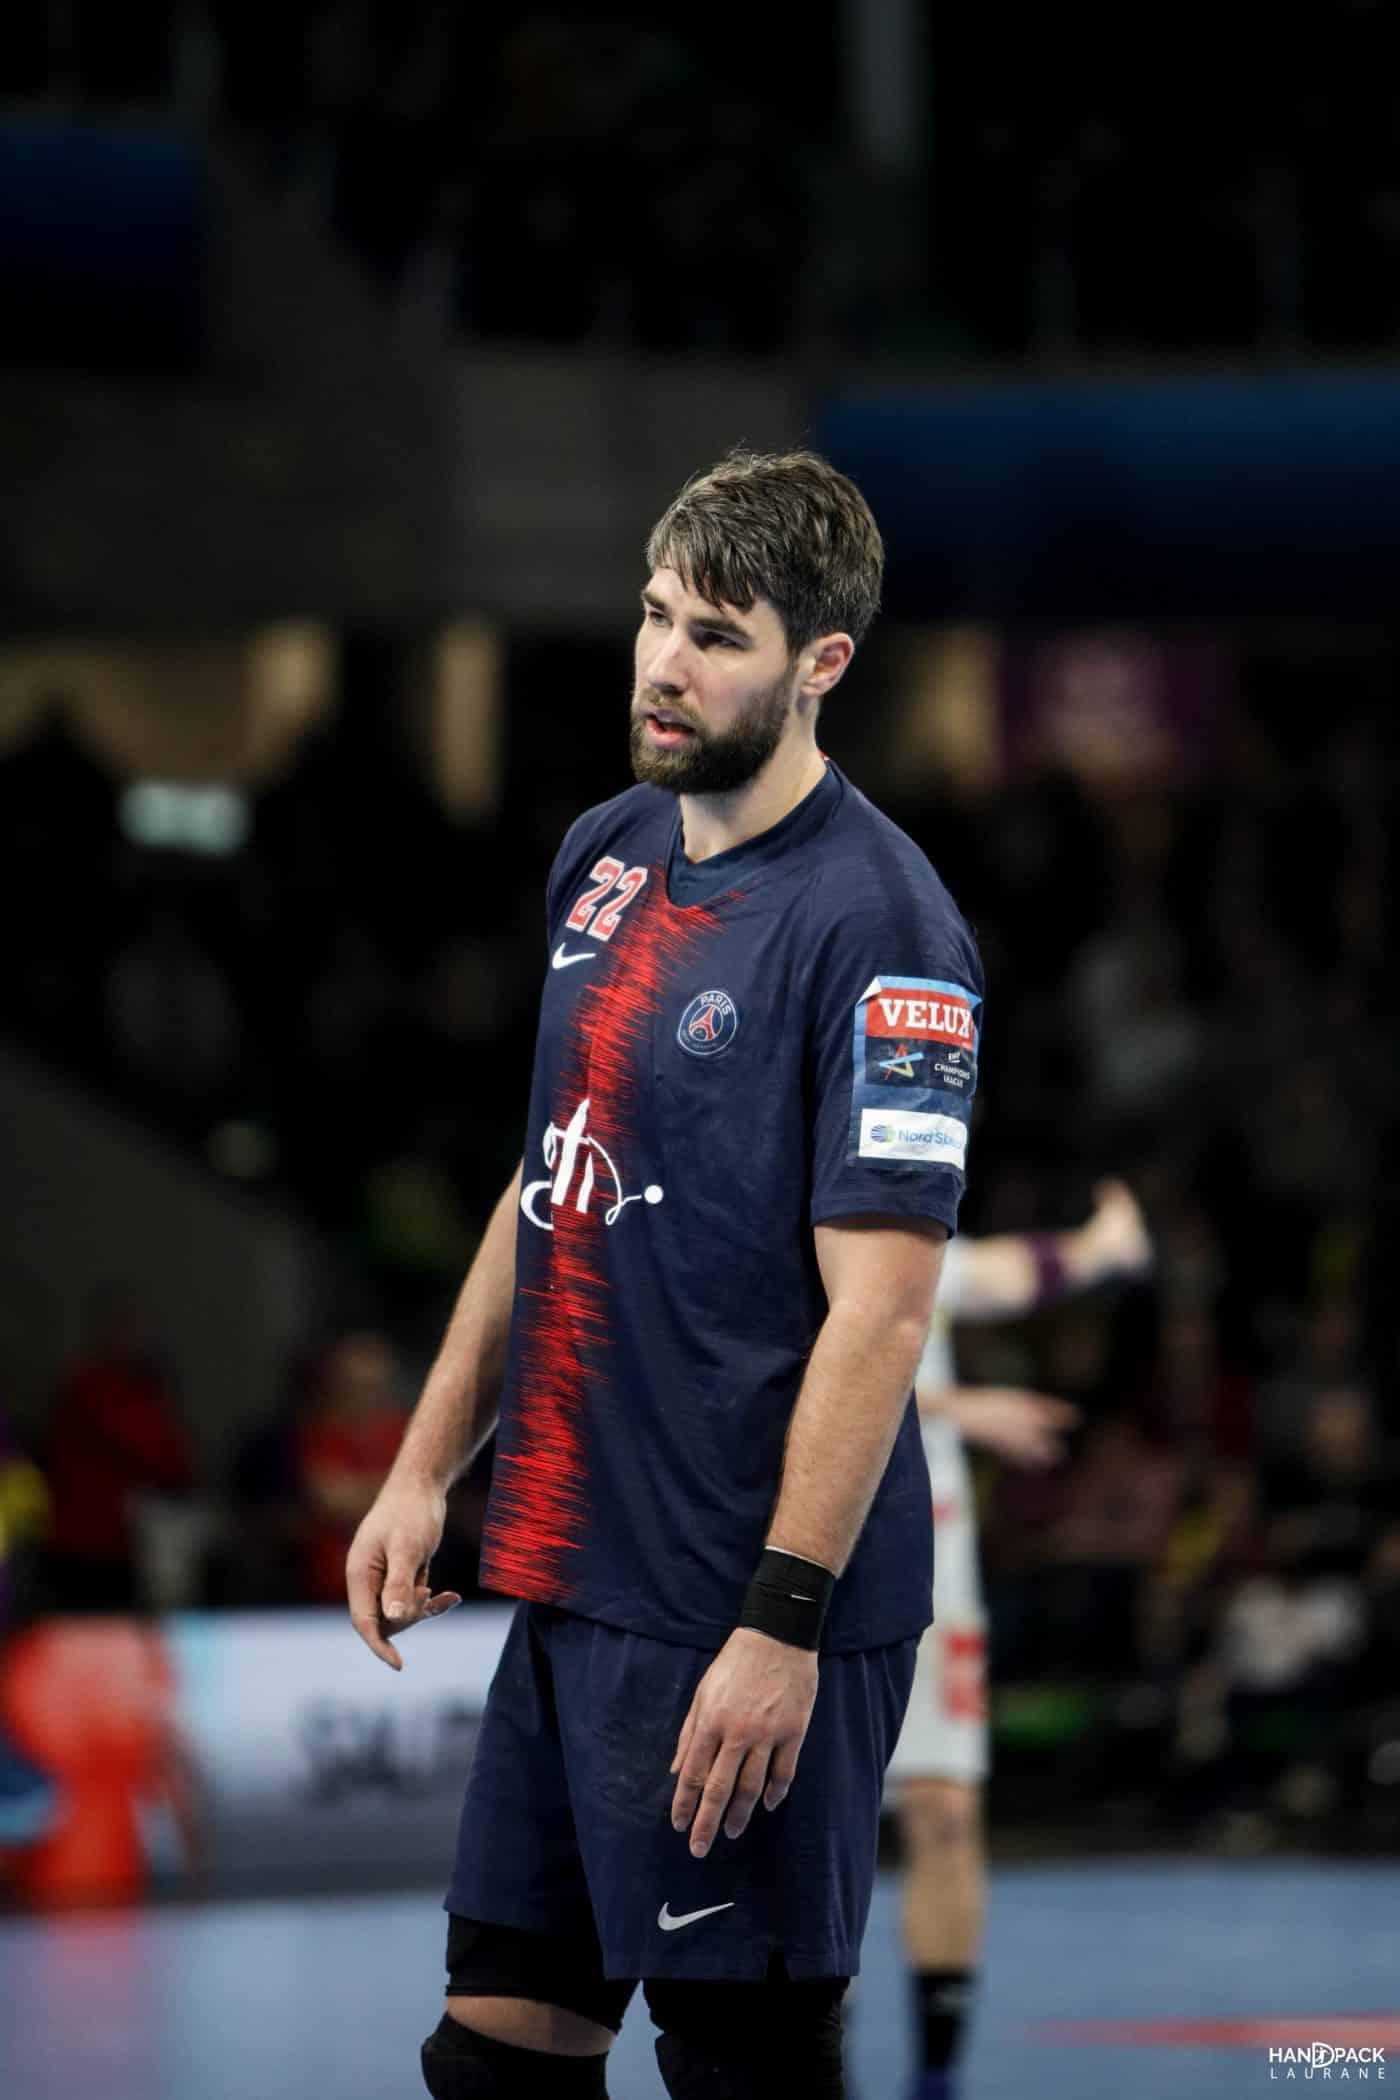 hbc-nantes-paris-saint-germain-handball-ligue-des-champions-2019-handpack-17